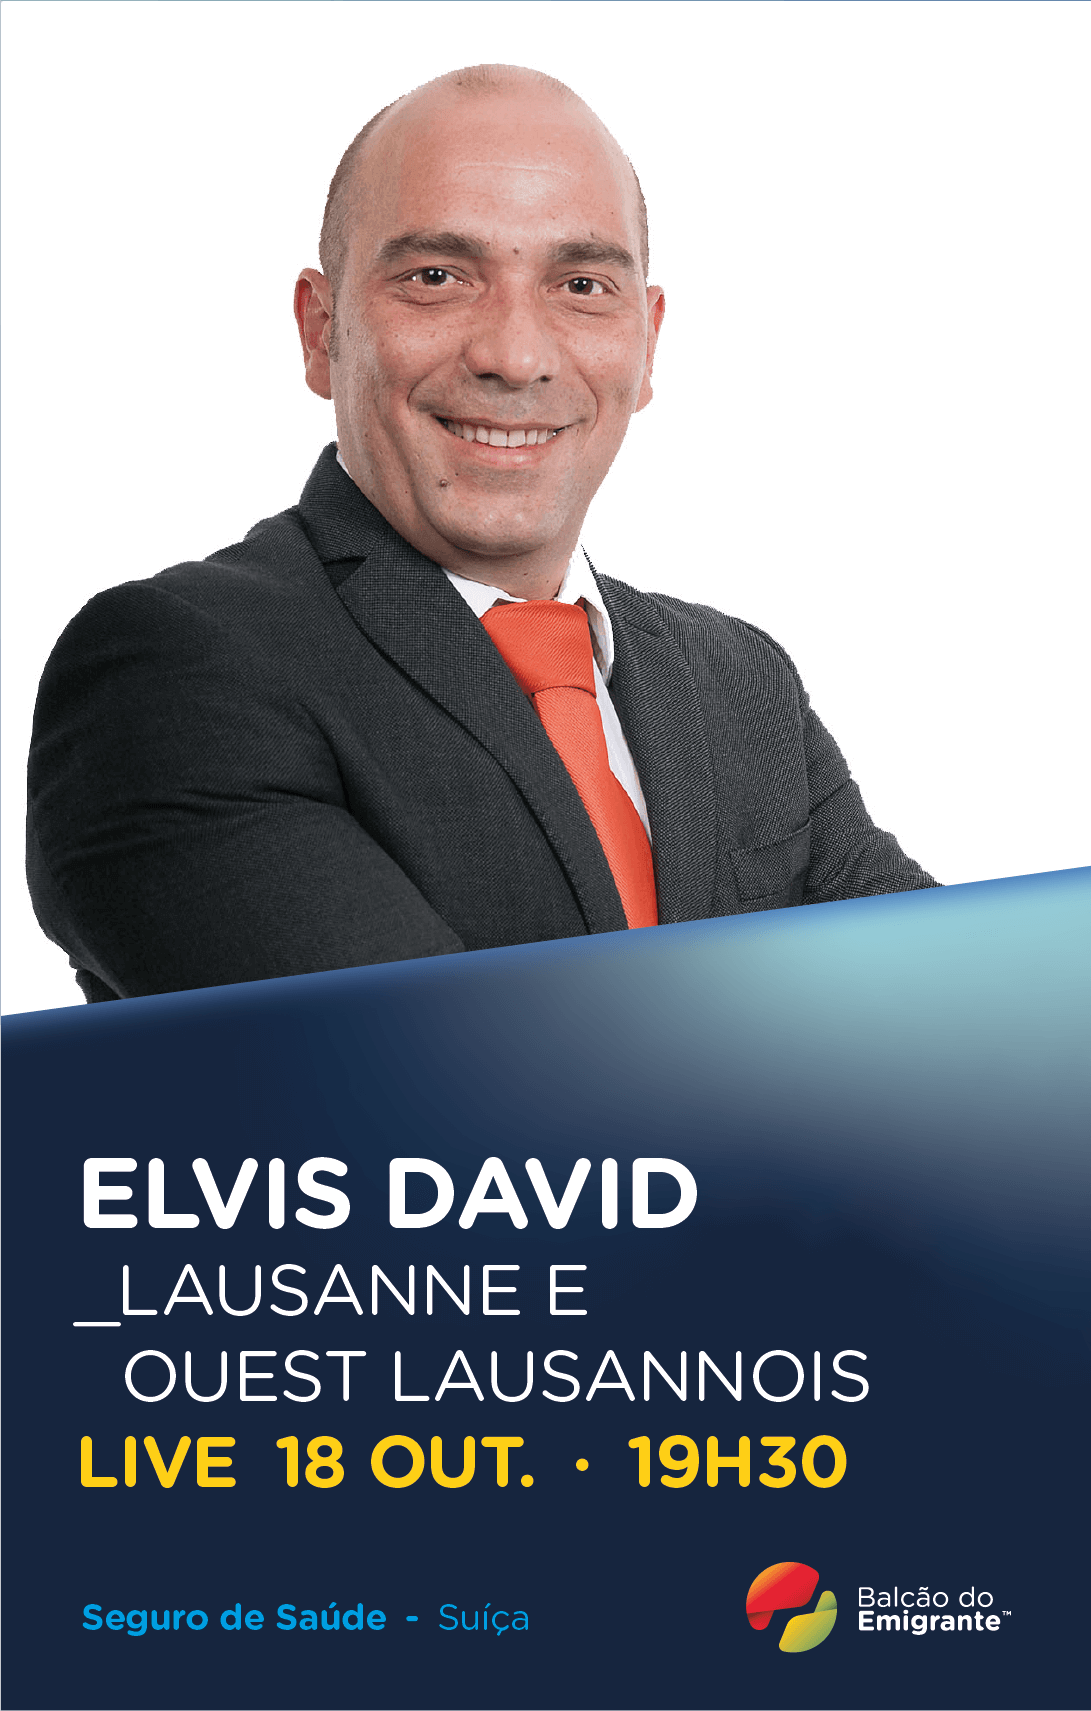 Elvis David - Especialista em Seguro de Saúde em Lausanne e Ouest Lausannois